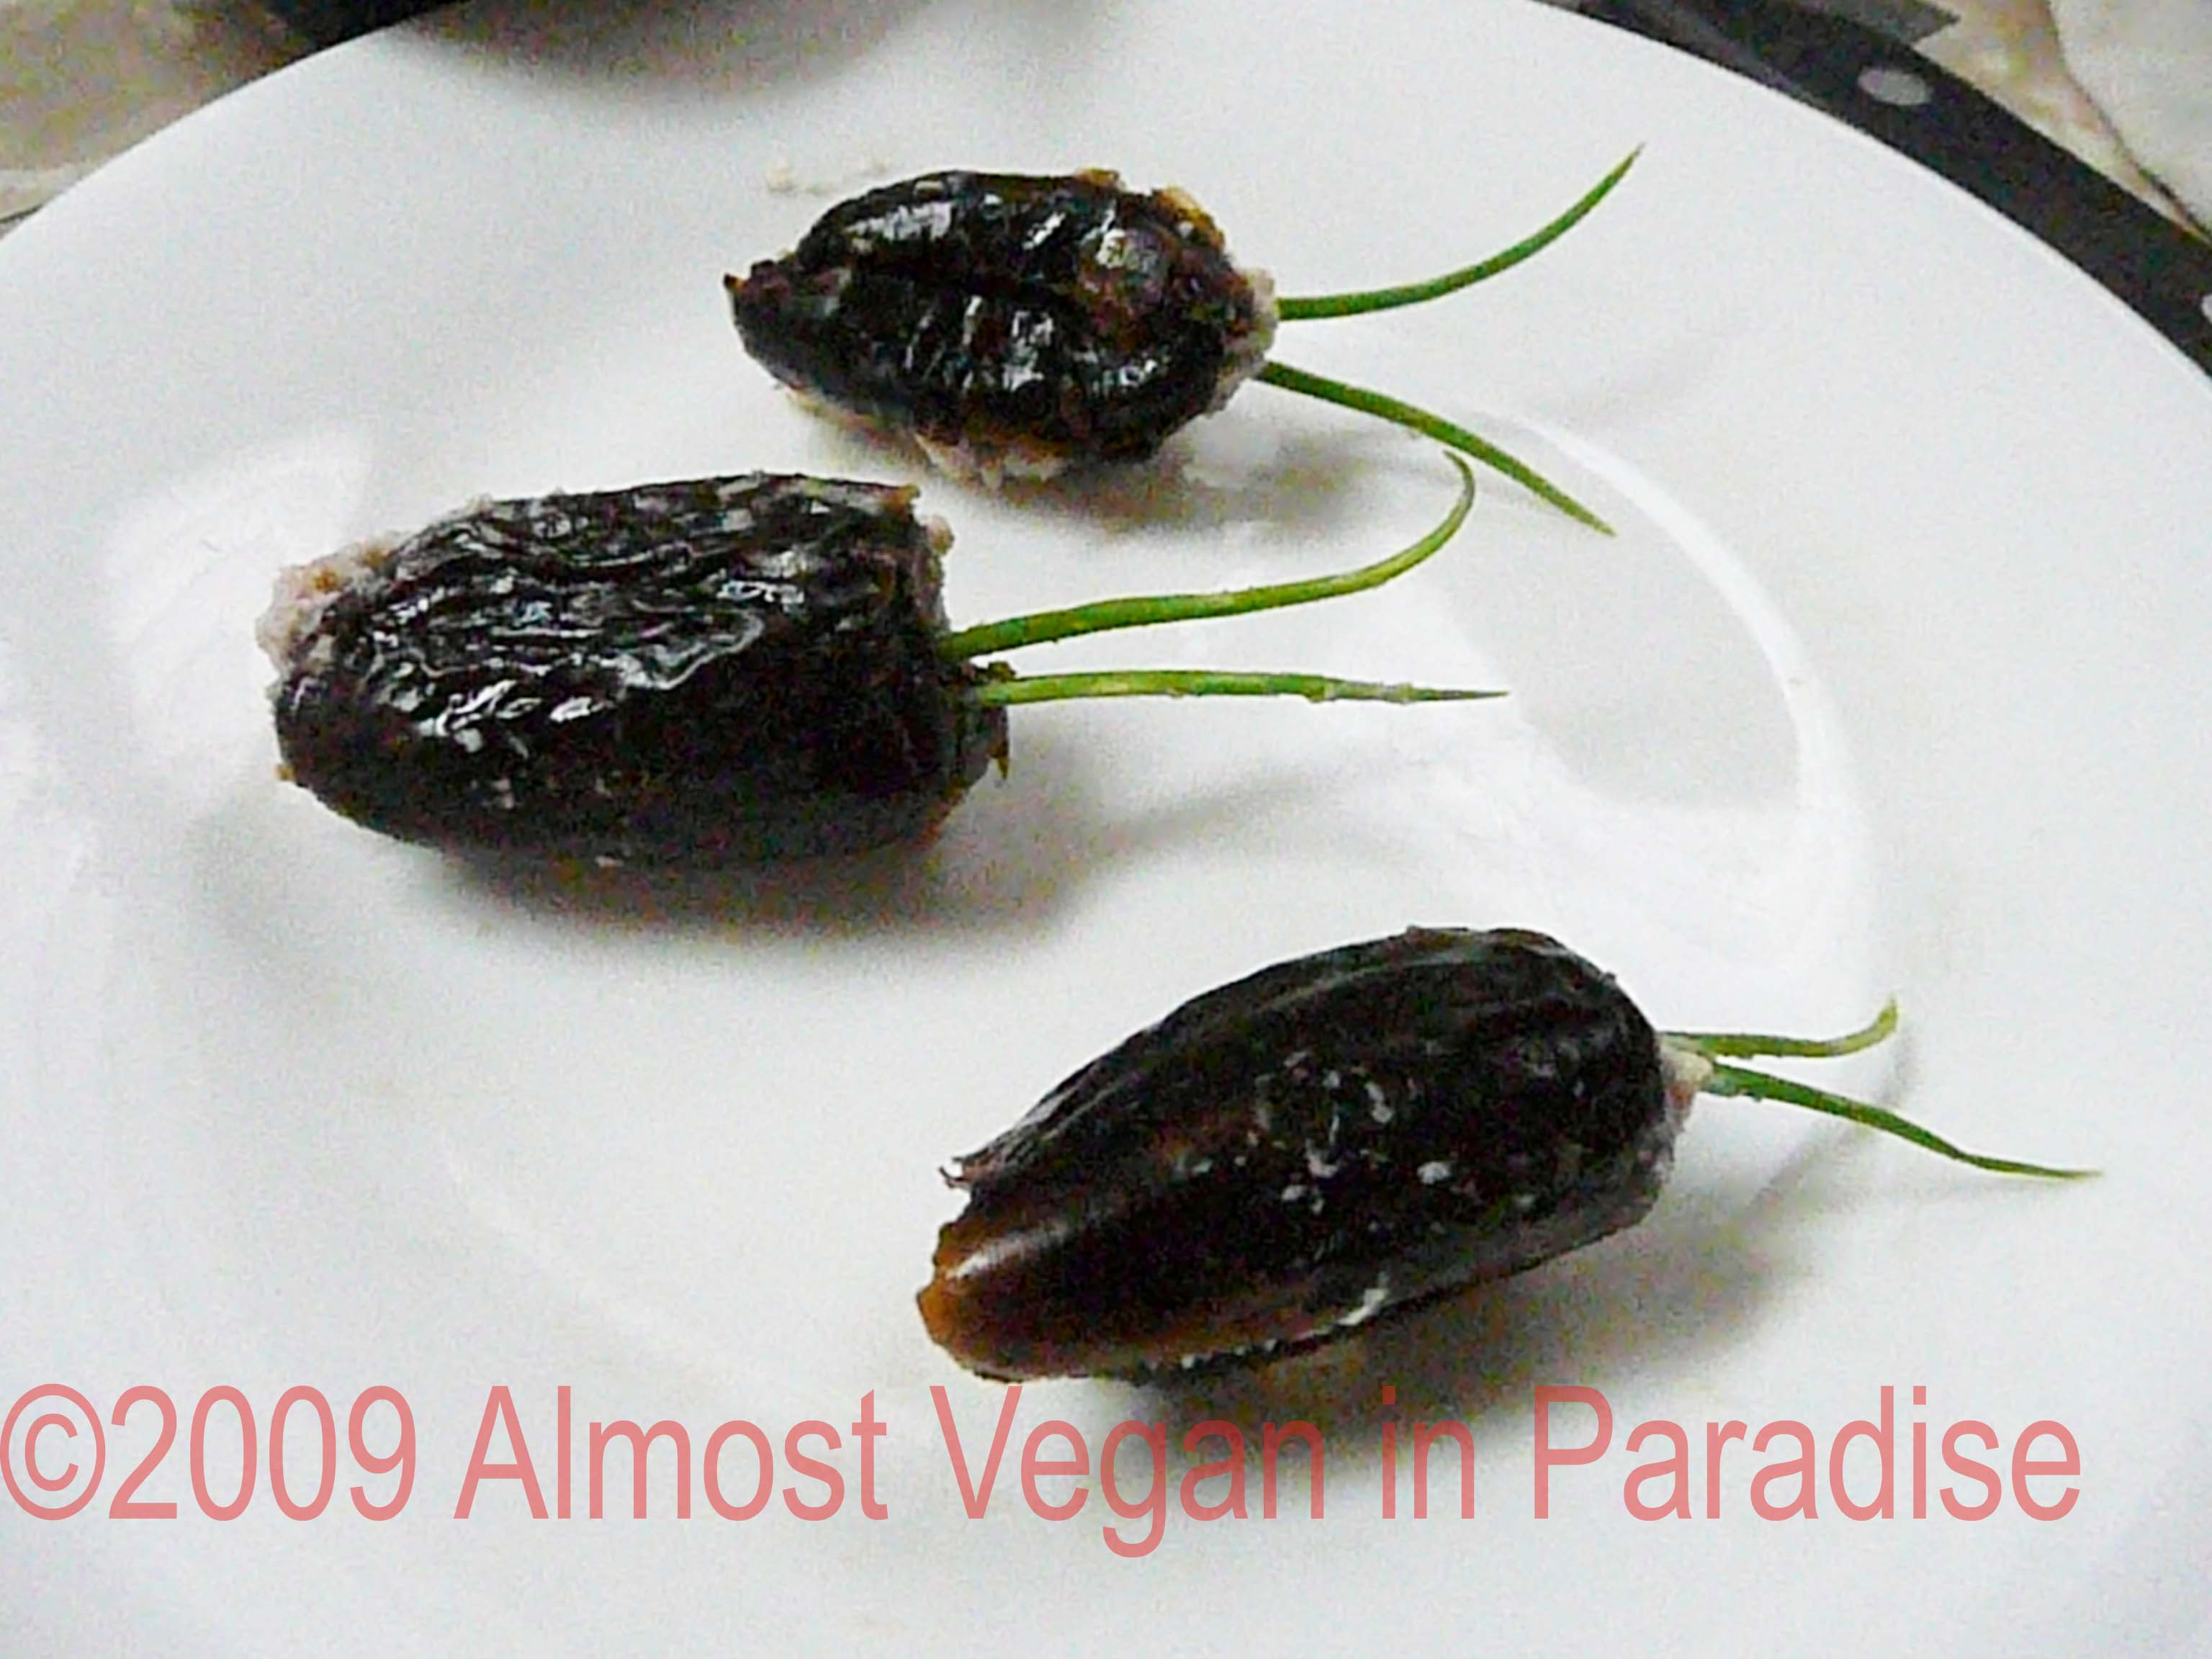 Vegan Halloween Party Food | Almost Vegan in Paradise